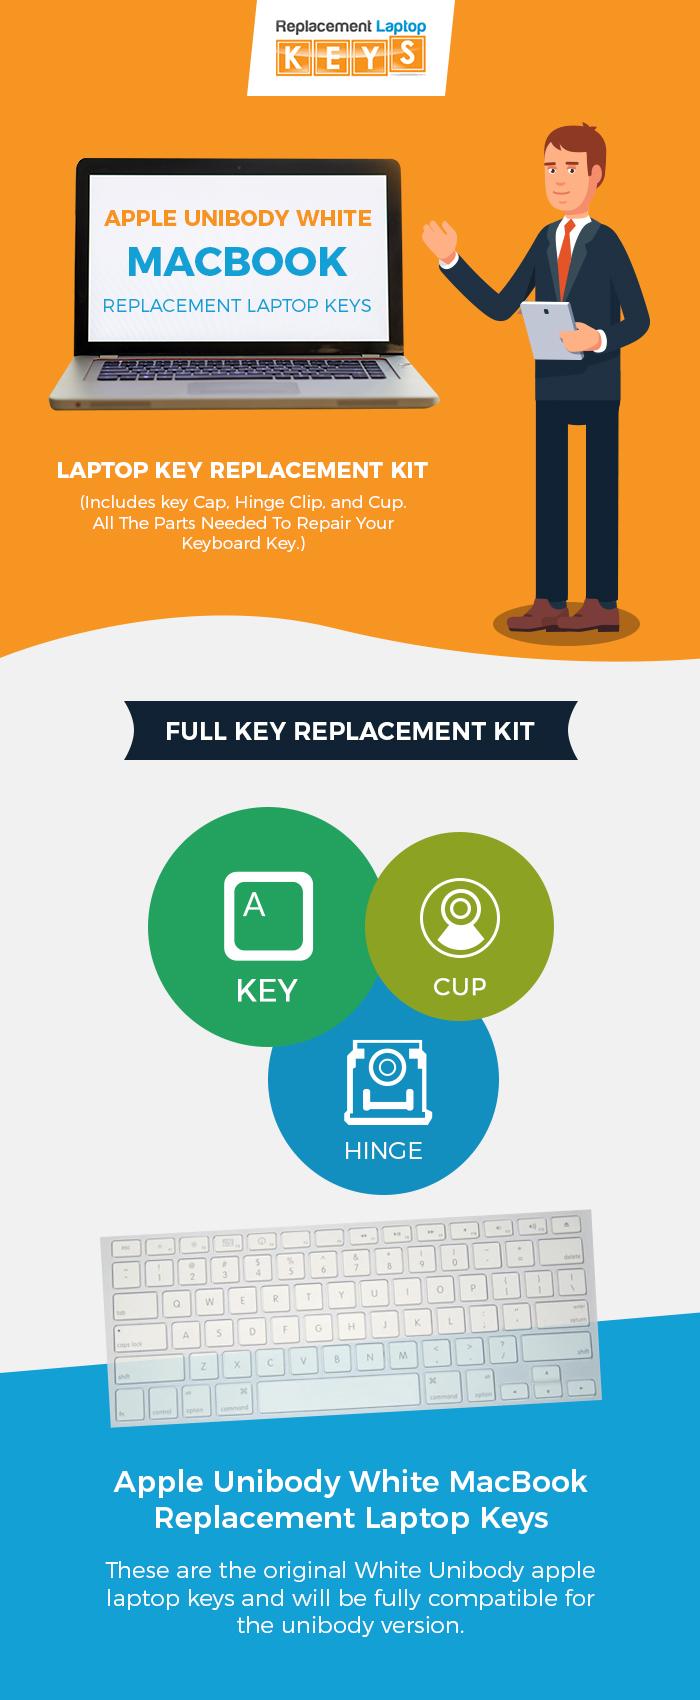 Buy Apple Unibody White MacBook Laptop Keyboard Keys from Replacement Laptop Keys